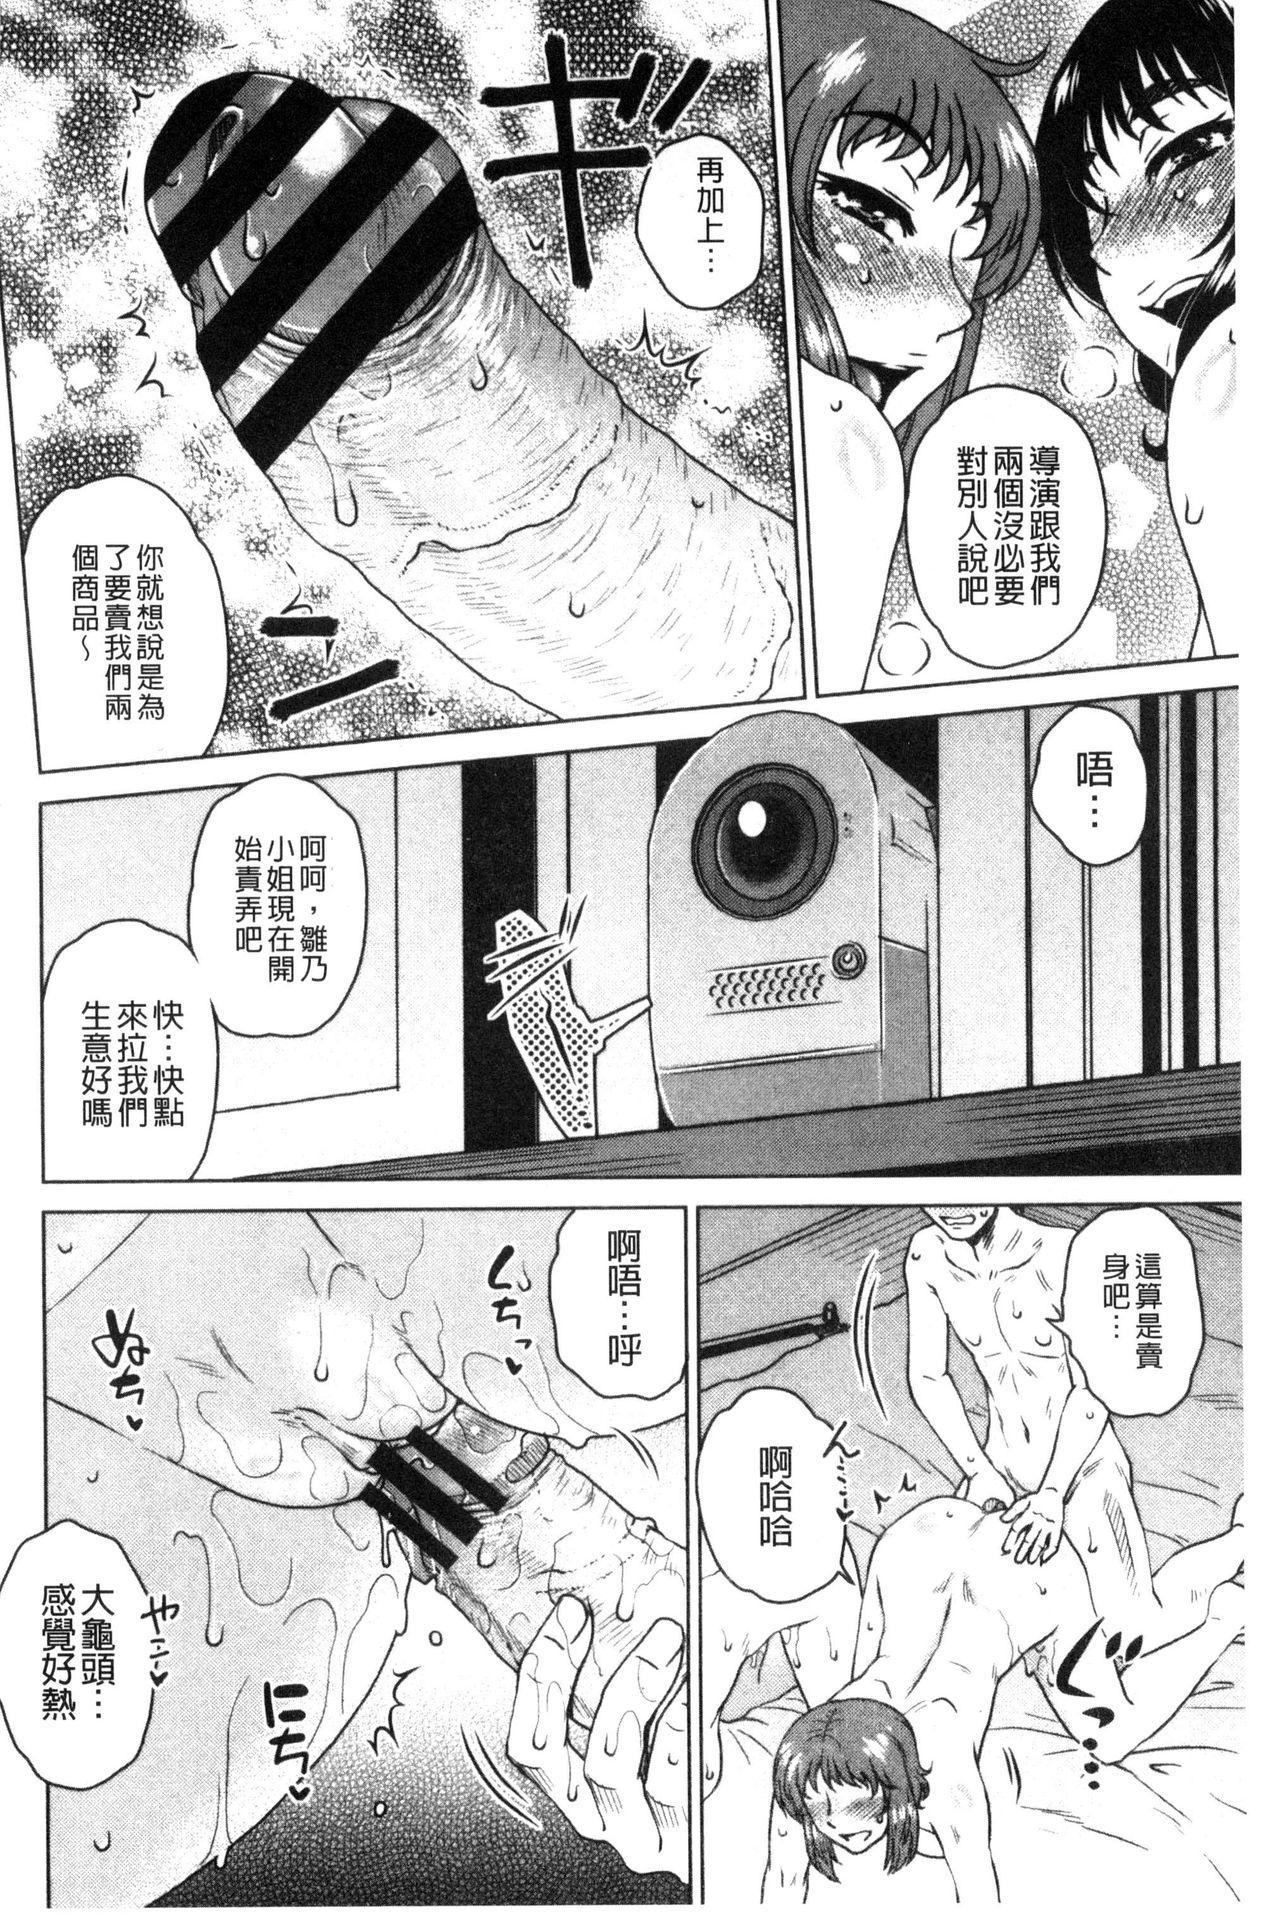 [Kurumiya Mashimin] Uchi no Shachou no Hamedere Inkatsu - Our President is HAME-DERE in Licentious sex life. [Chinese] 76